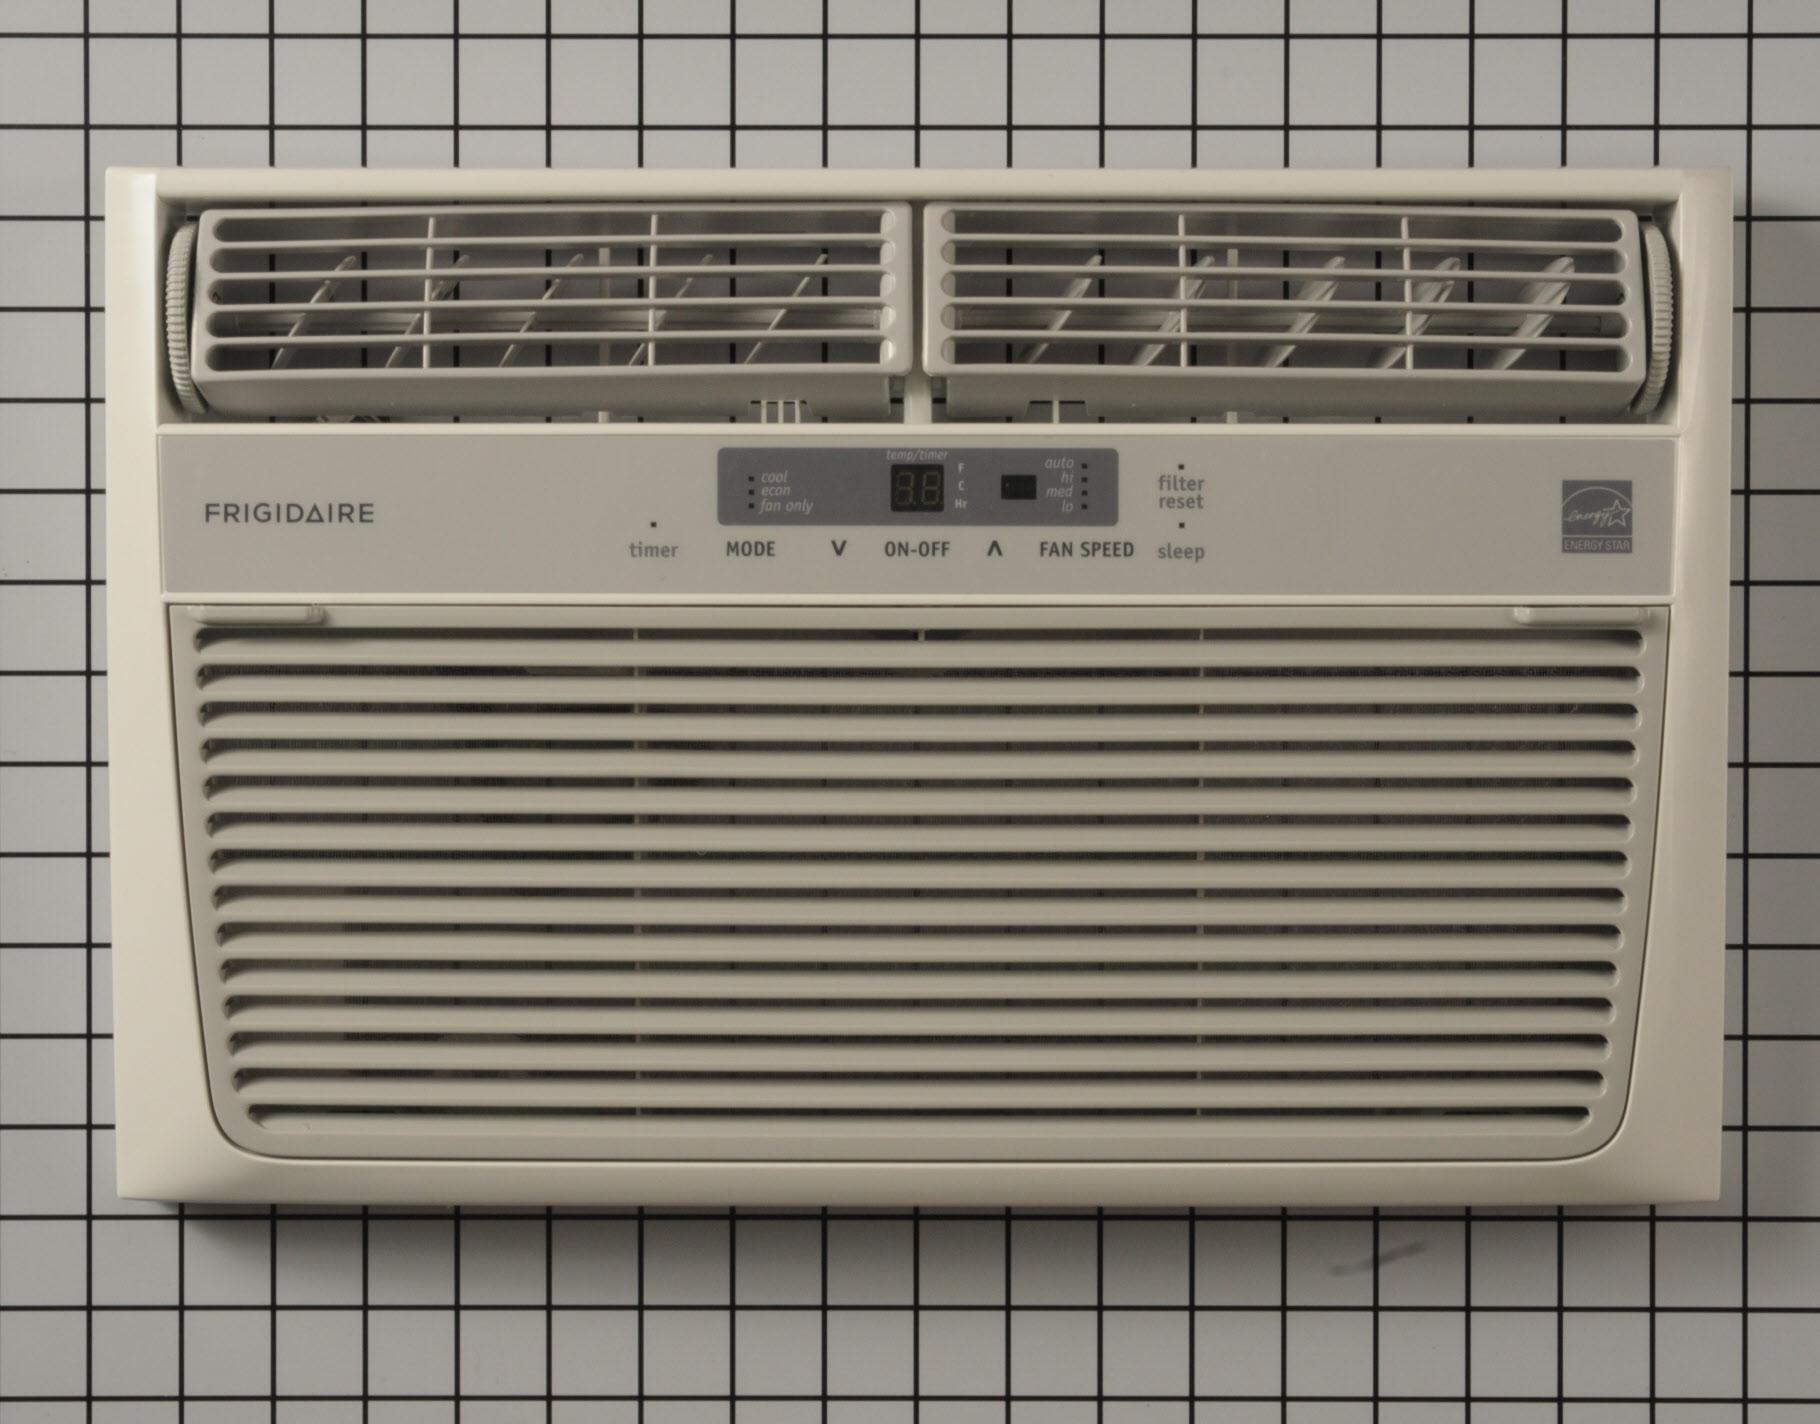 Frigidaire Air Conditioner Part # 5304477069 - Front Panel